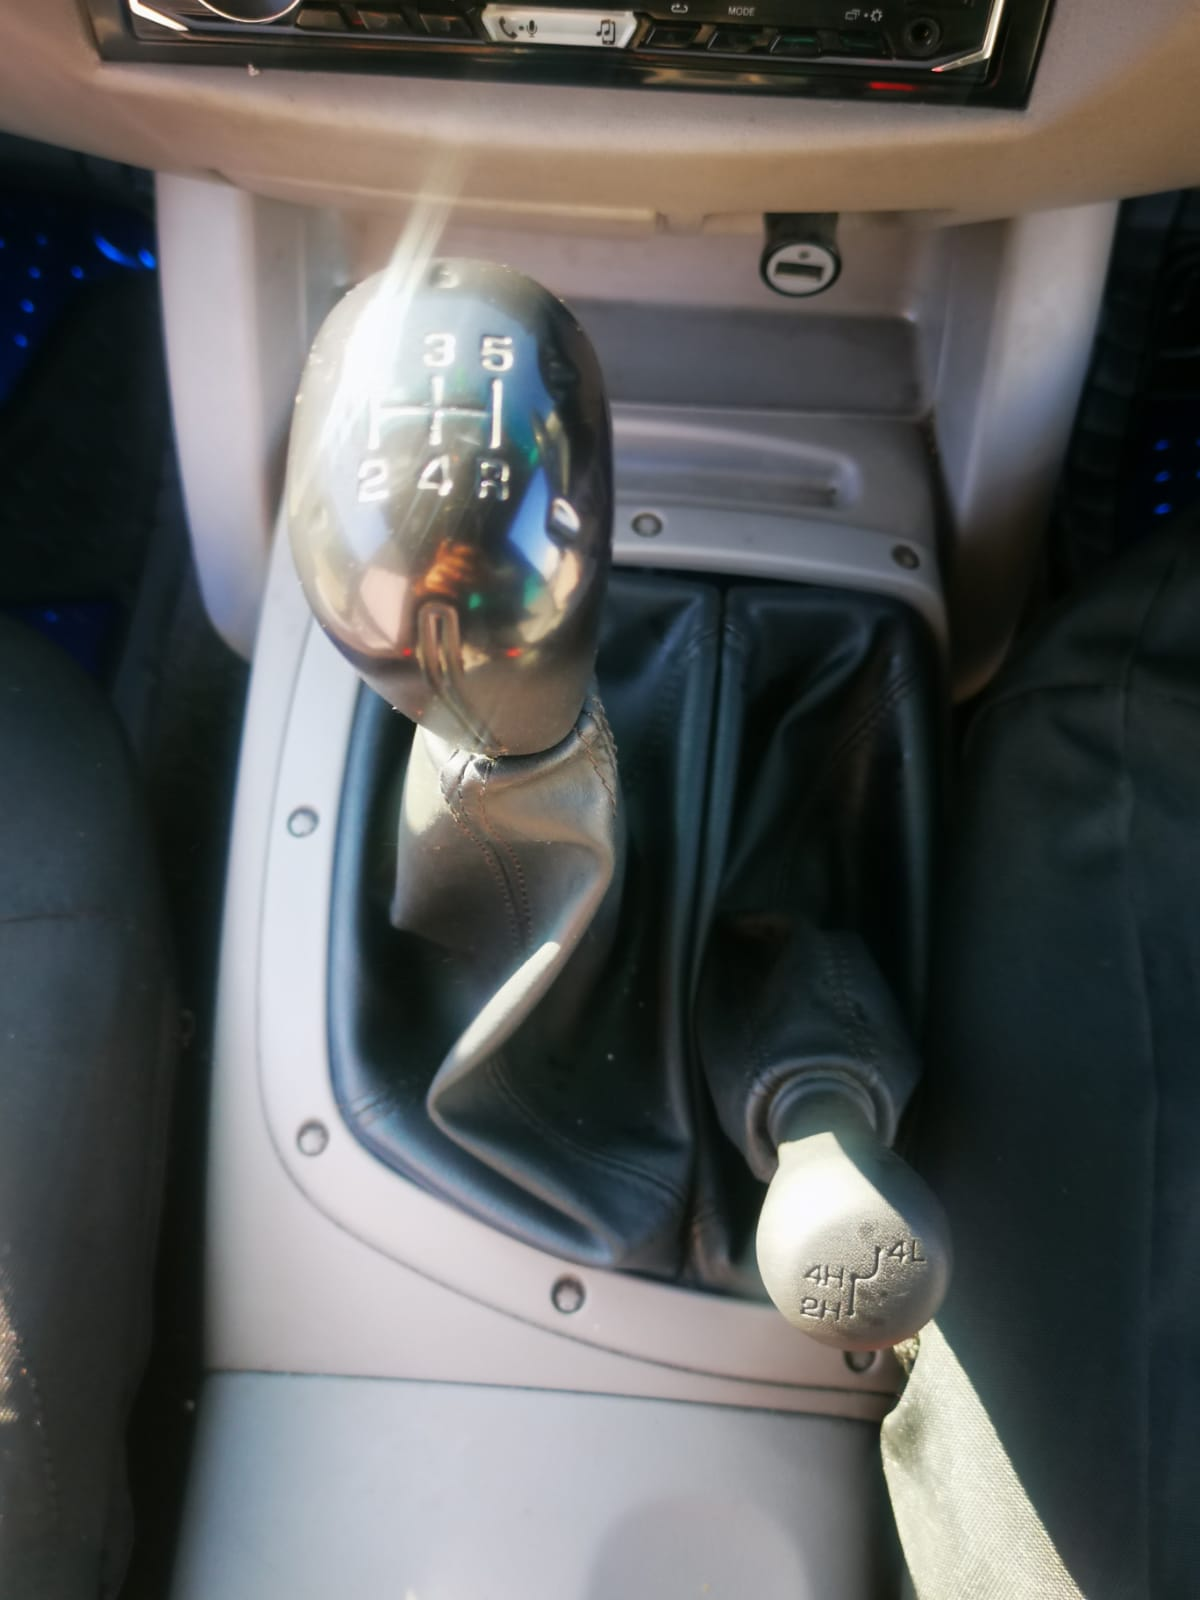 2010 Mitsubishi Triton 3.2DI D 4x4 ClubCab